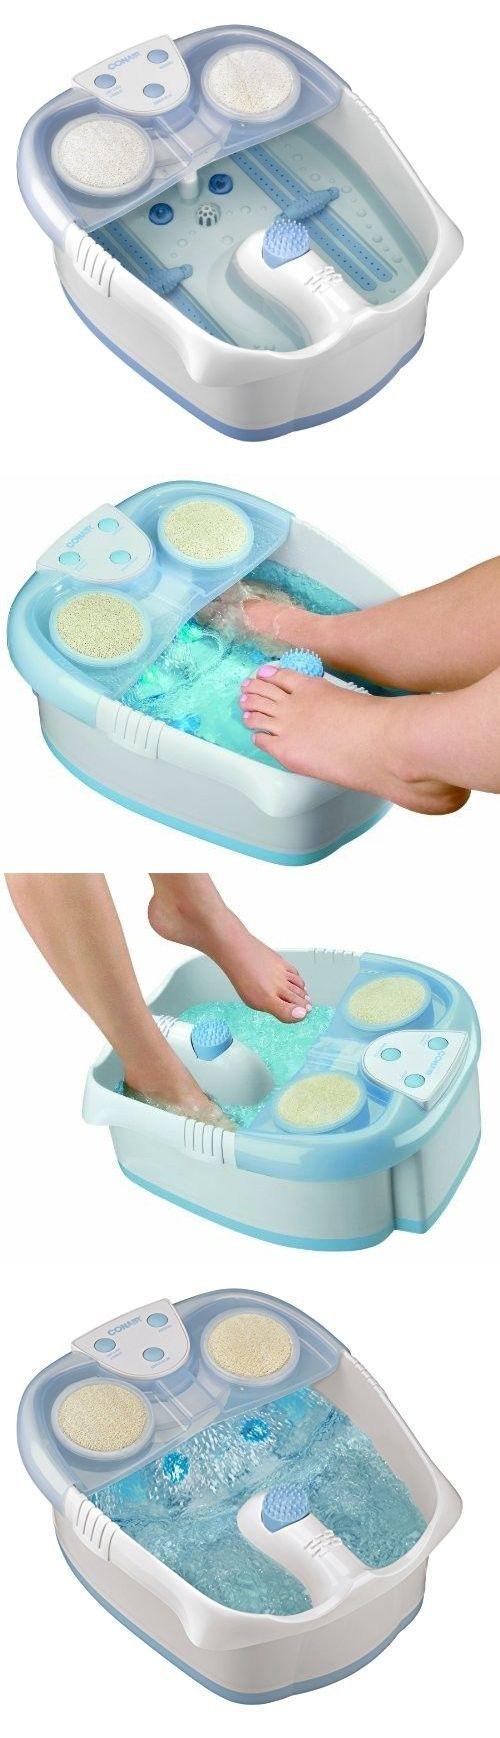 top 25 best pedicure tub ideas on pinterest pedicure spa spas baths and supplies foot spa massager conair tub bath pedicure bubbles heat lights therapy